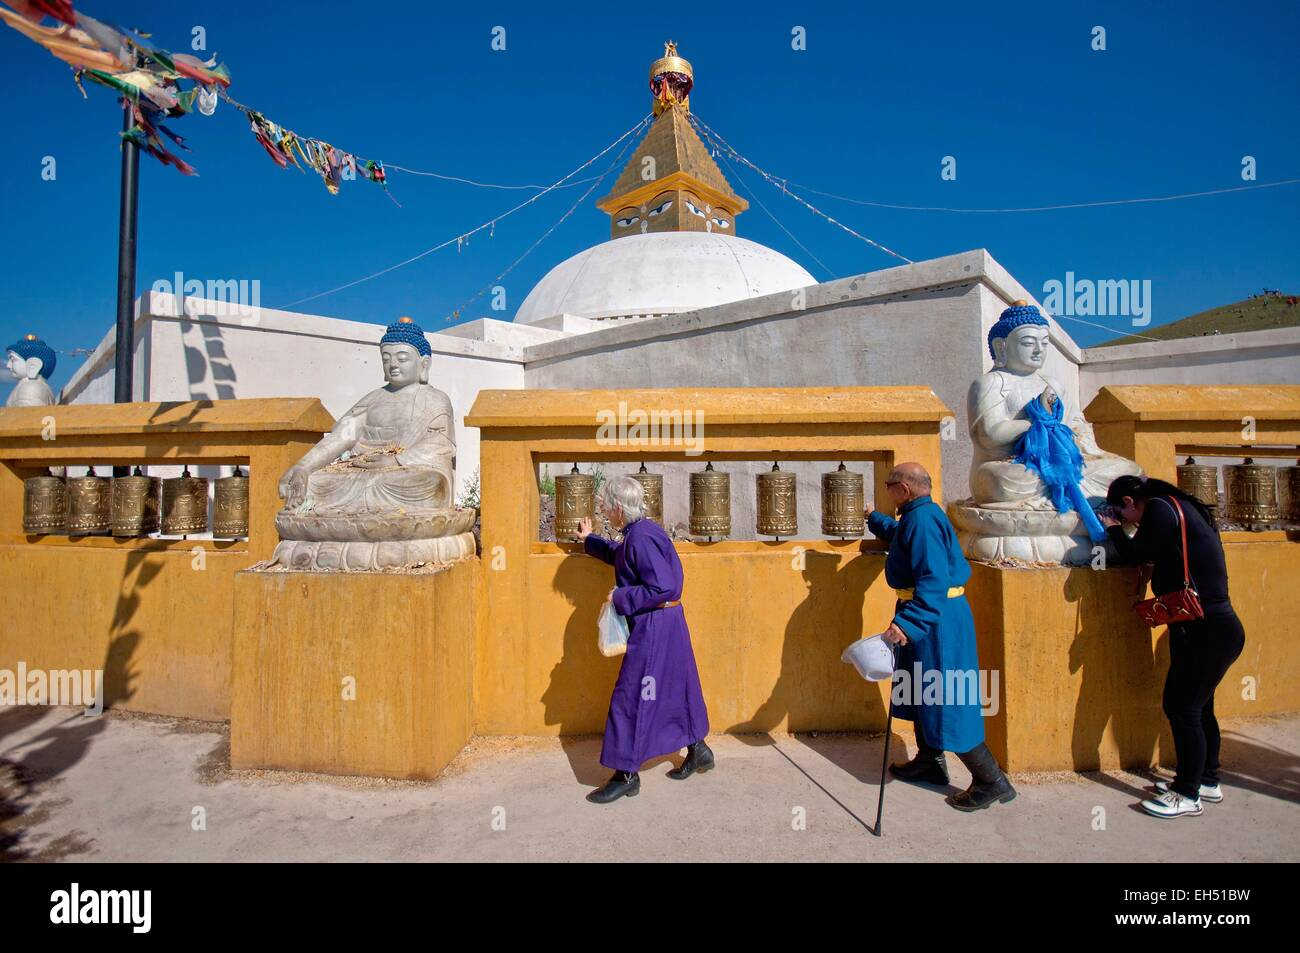 Mongolia, Selenge, Amarbayasgalant Khiid, stupa in monastery - Stock Image